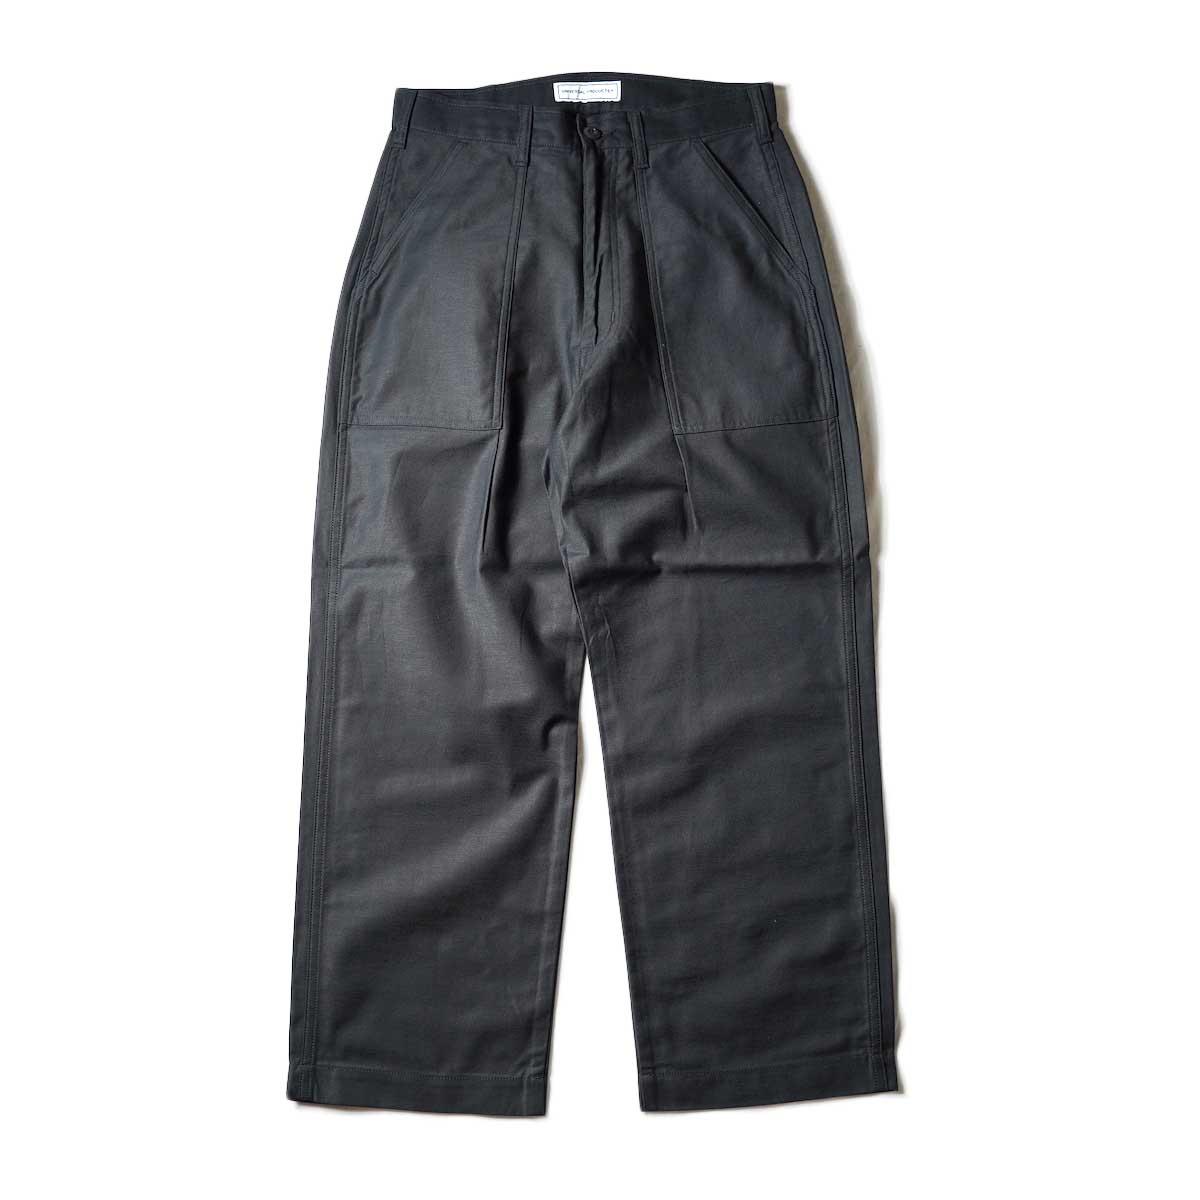 UNIVERSAL PRODUCTS / Gung Ho 1tuck Baker Pants (Black)